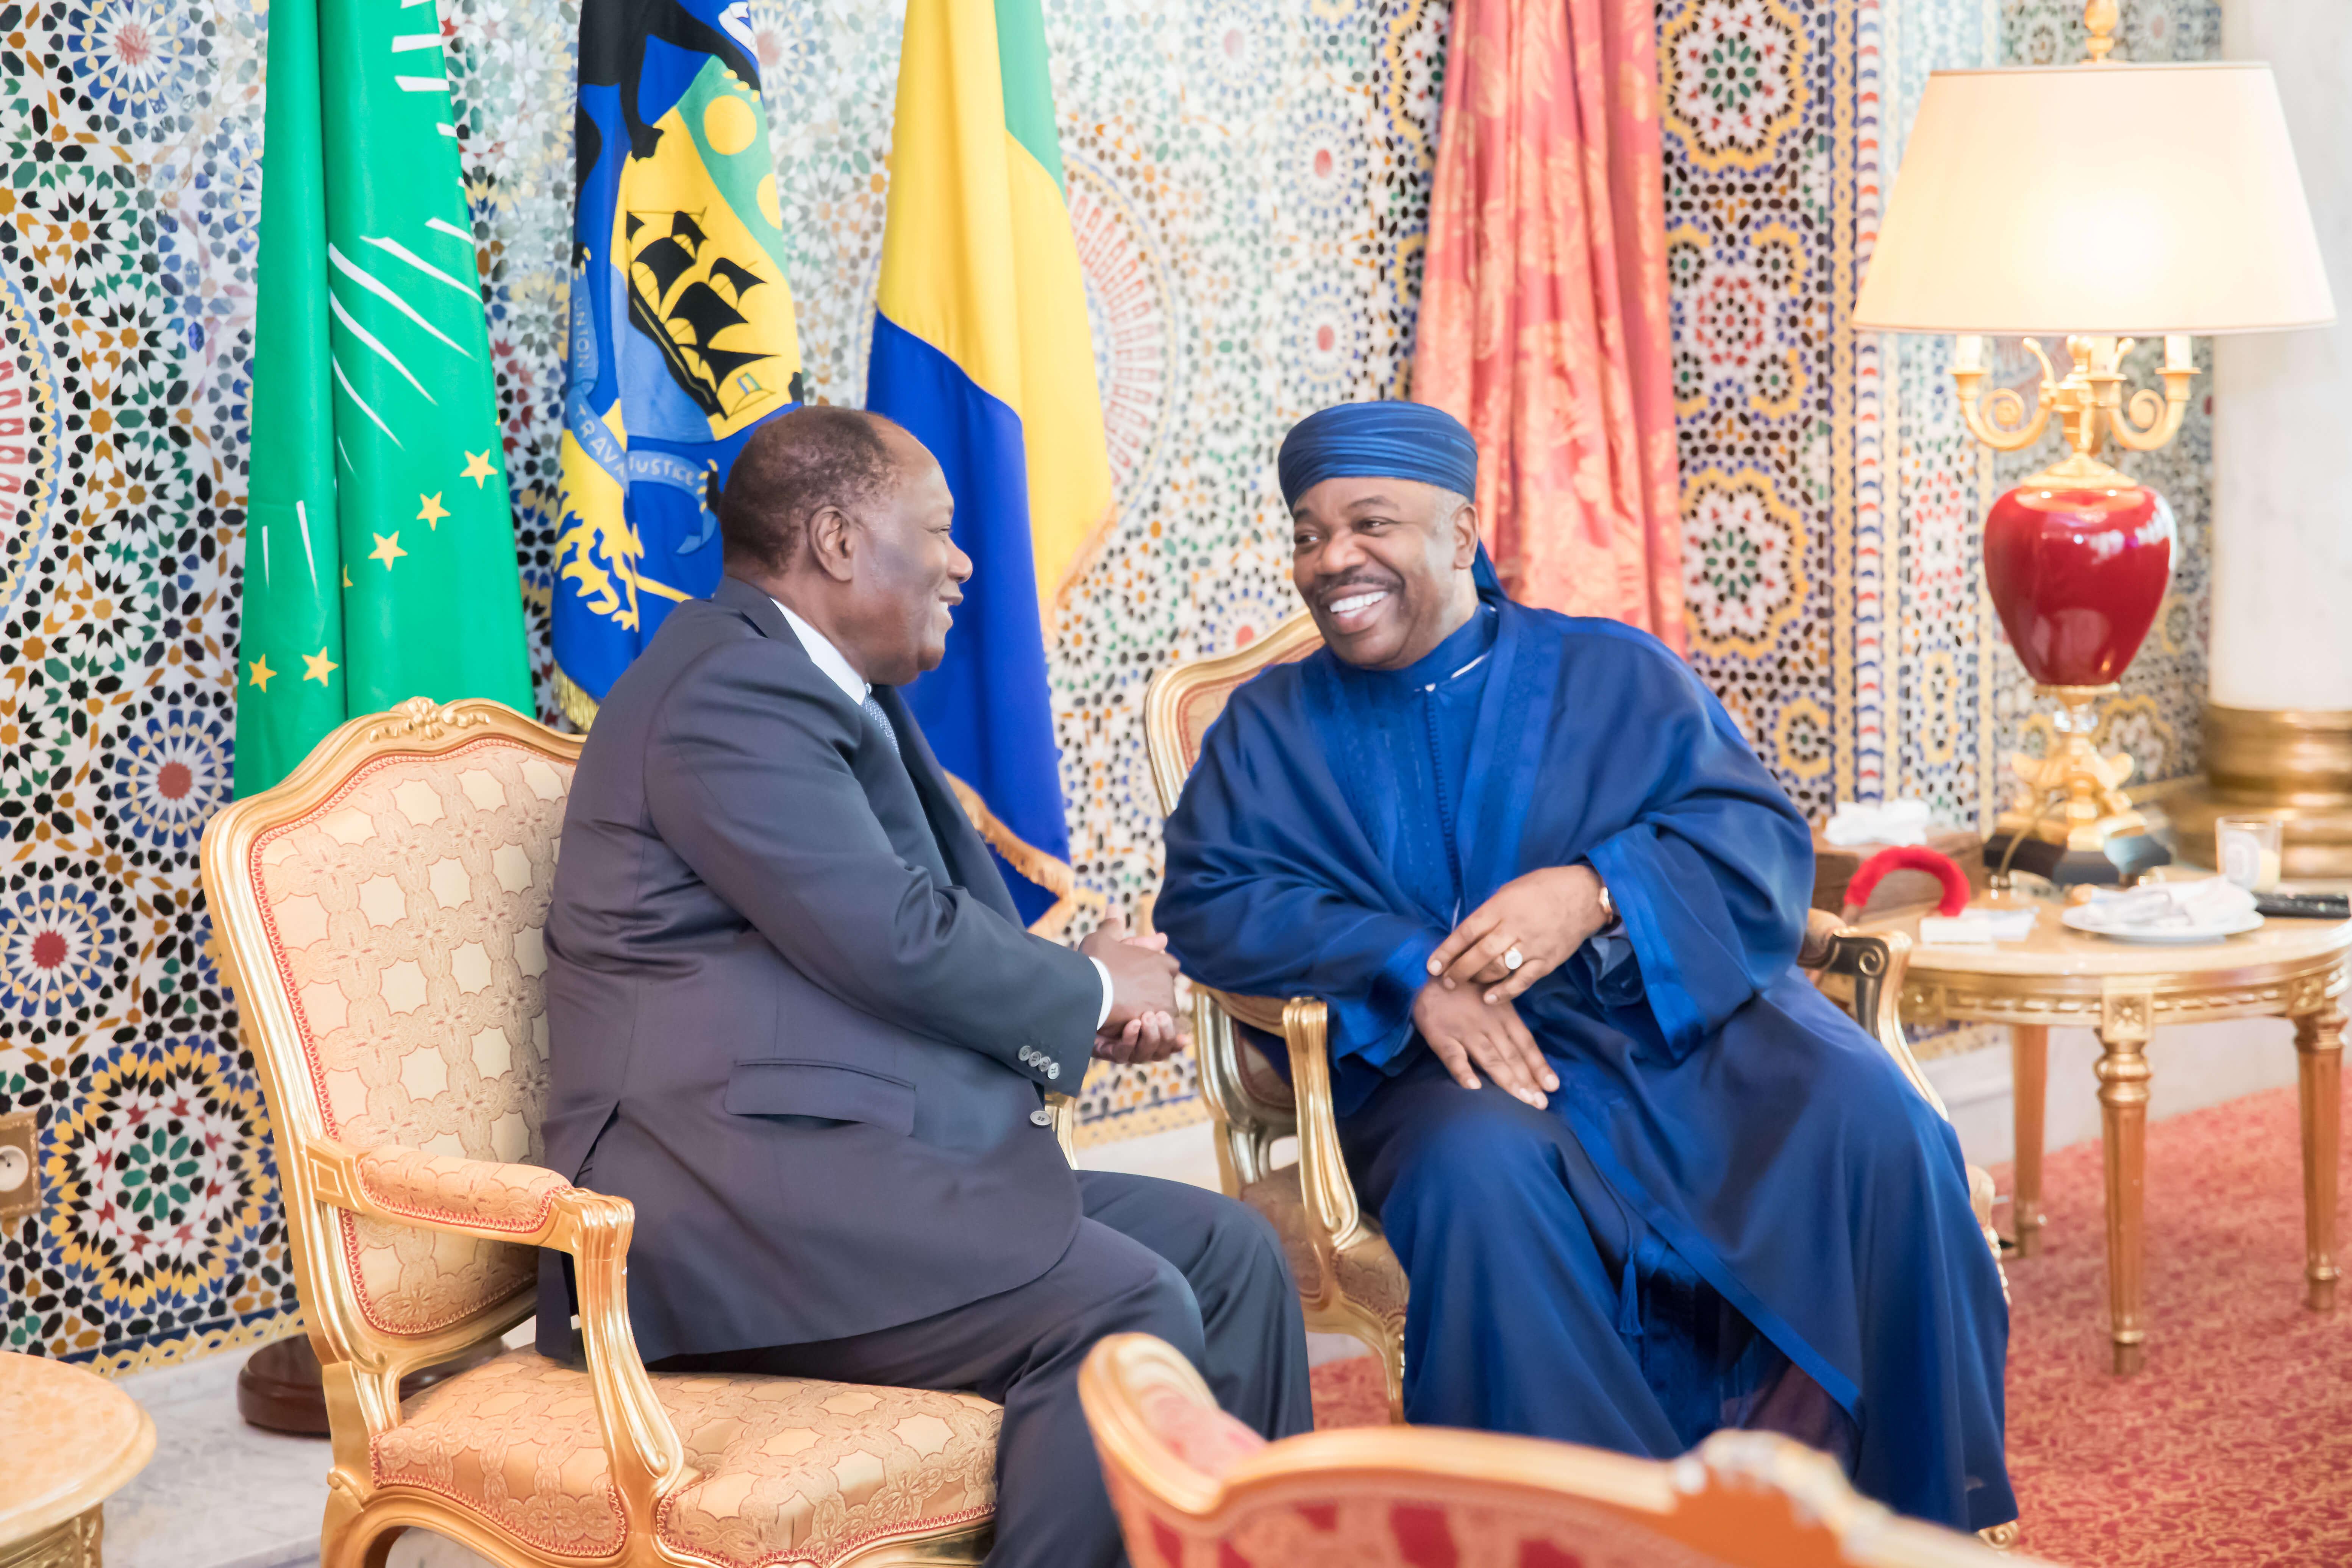 Entretien entre S.E. Ali Bongo Ondimba et S.E. Alassane Dramane Ouattara